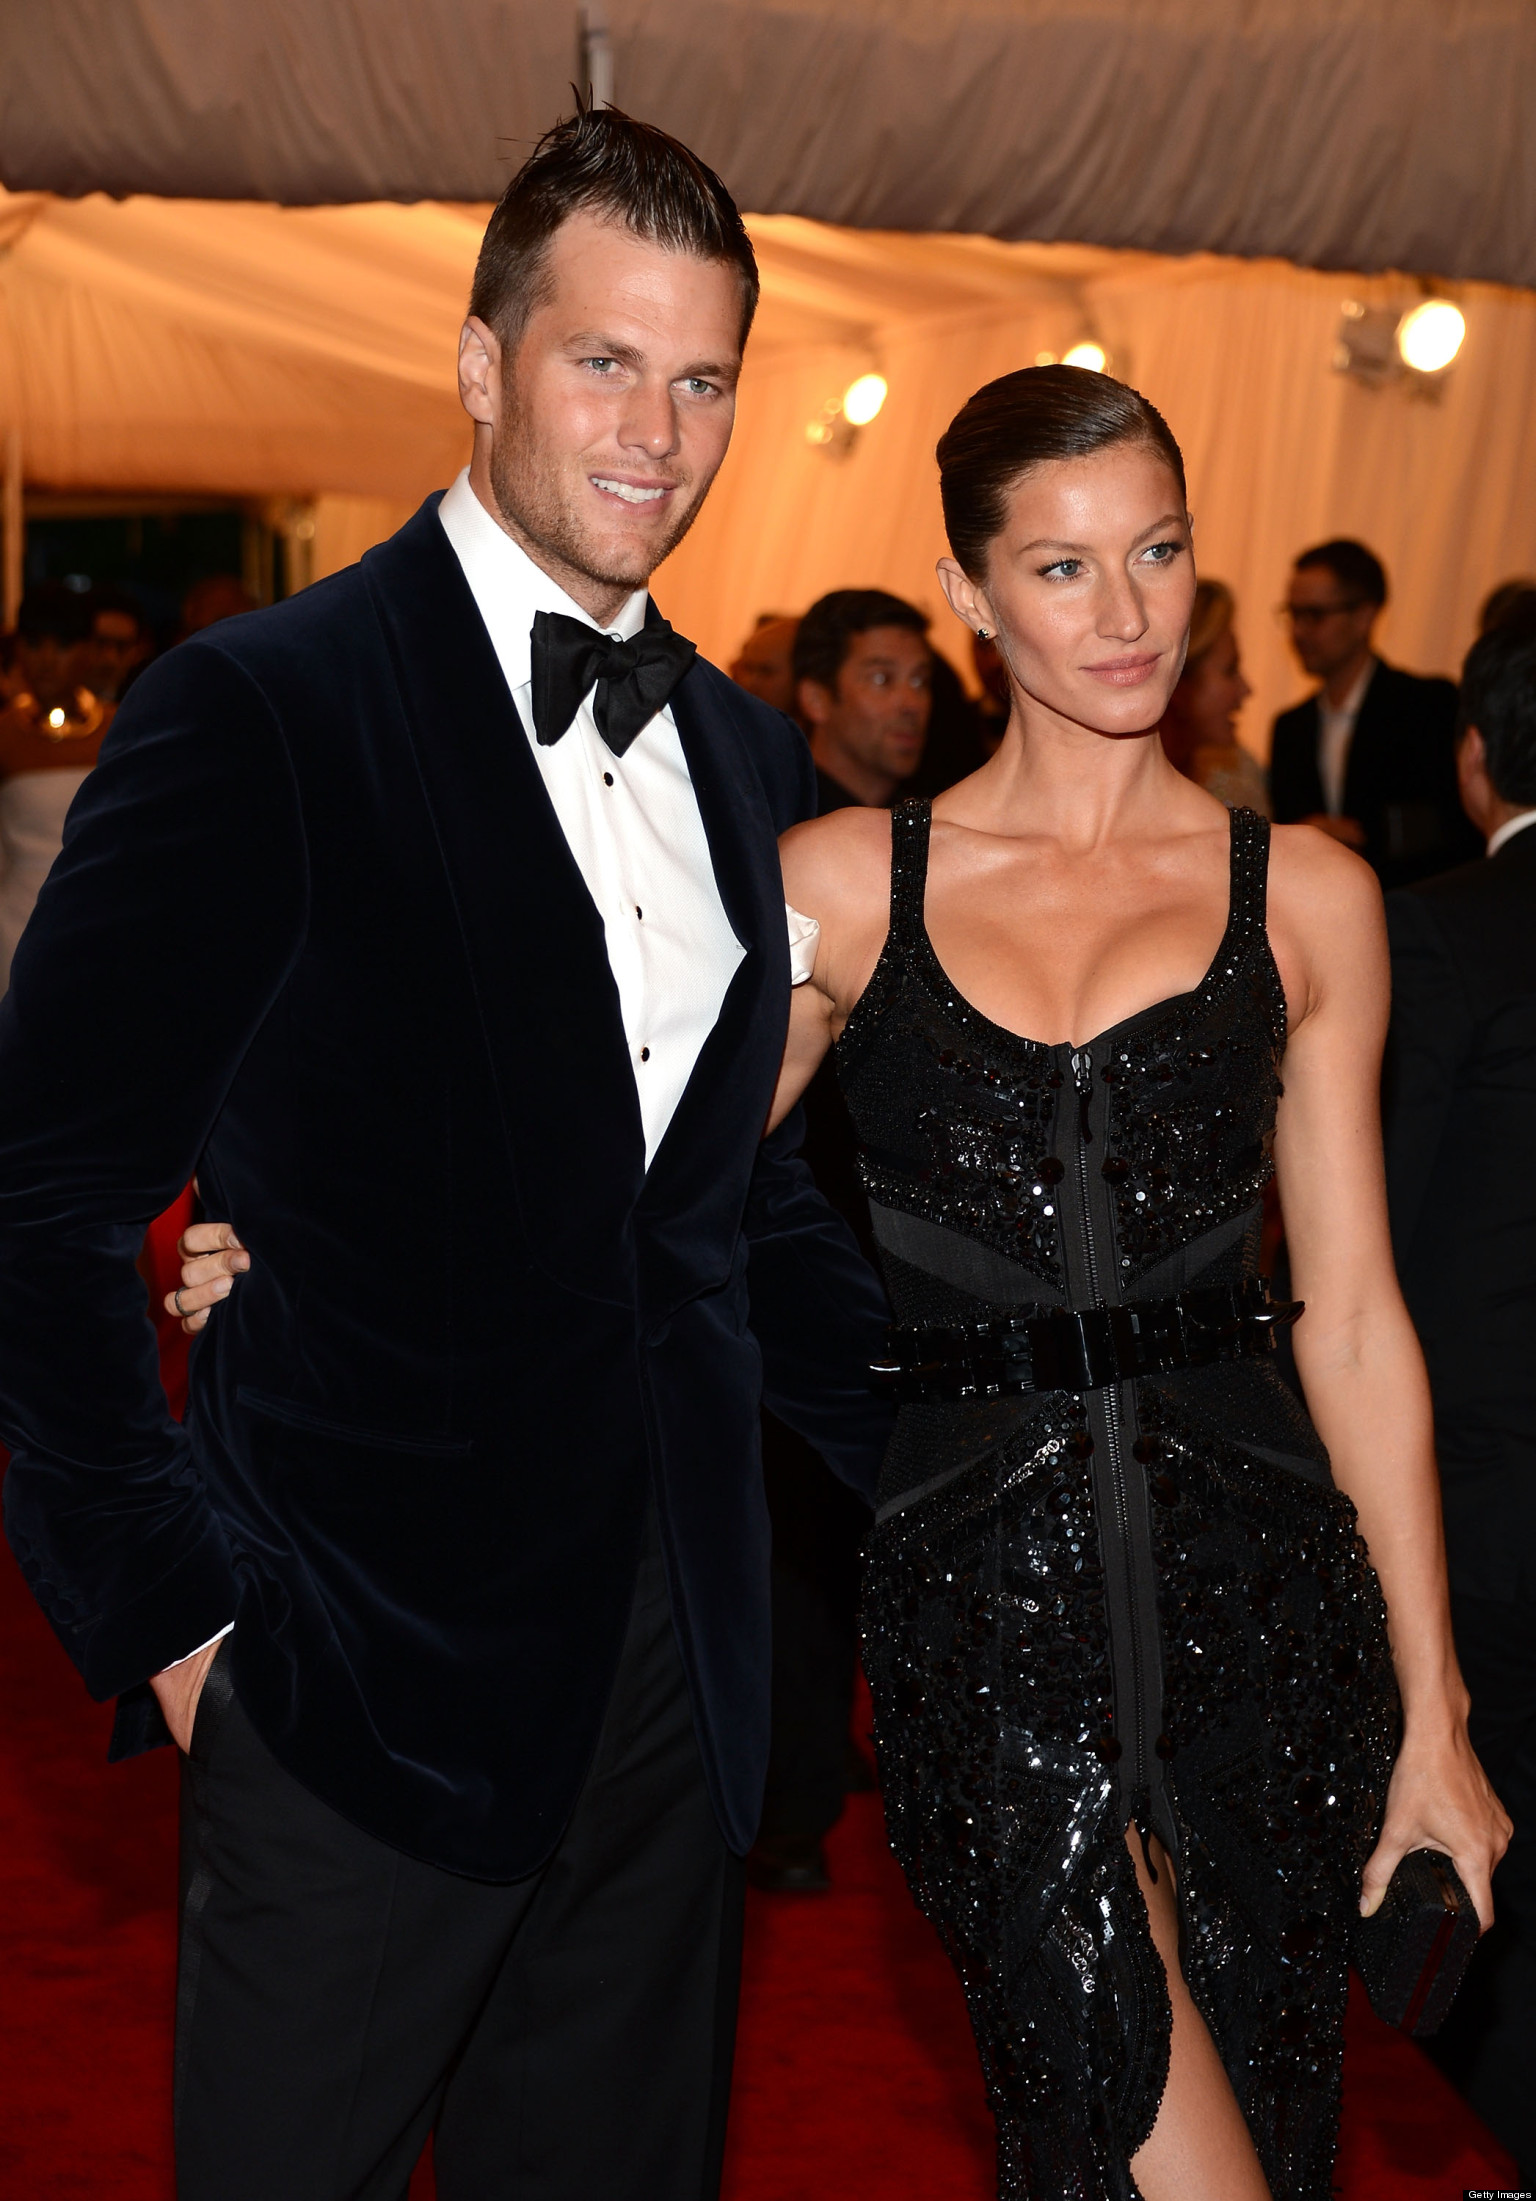 Gisele Bundchen, Tom Brady Welcome Baby Daughter, Vivian ... Gisele Bundchen Facebook